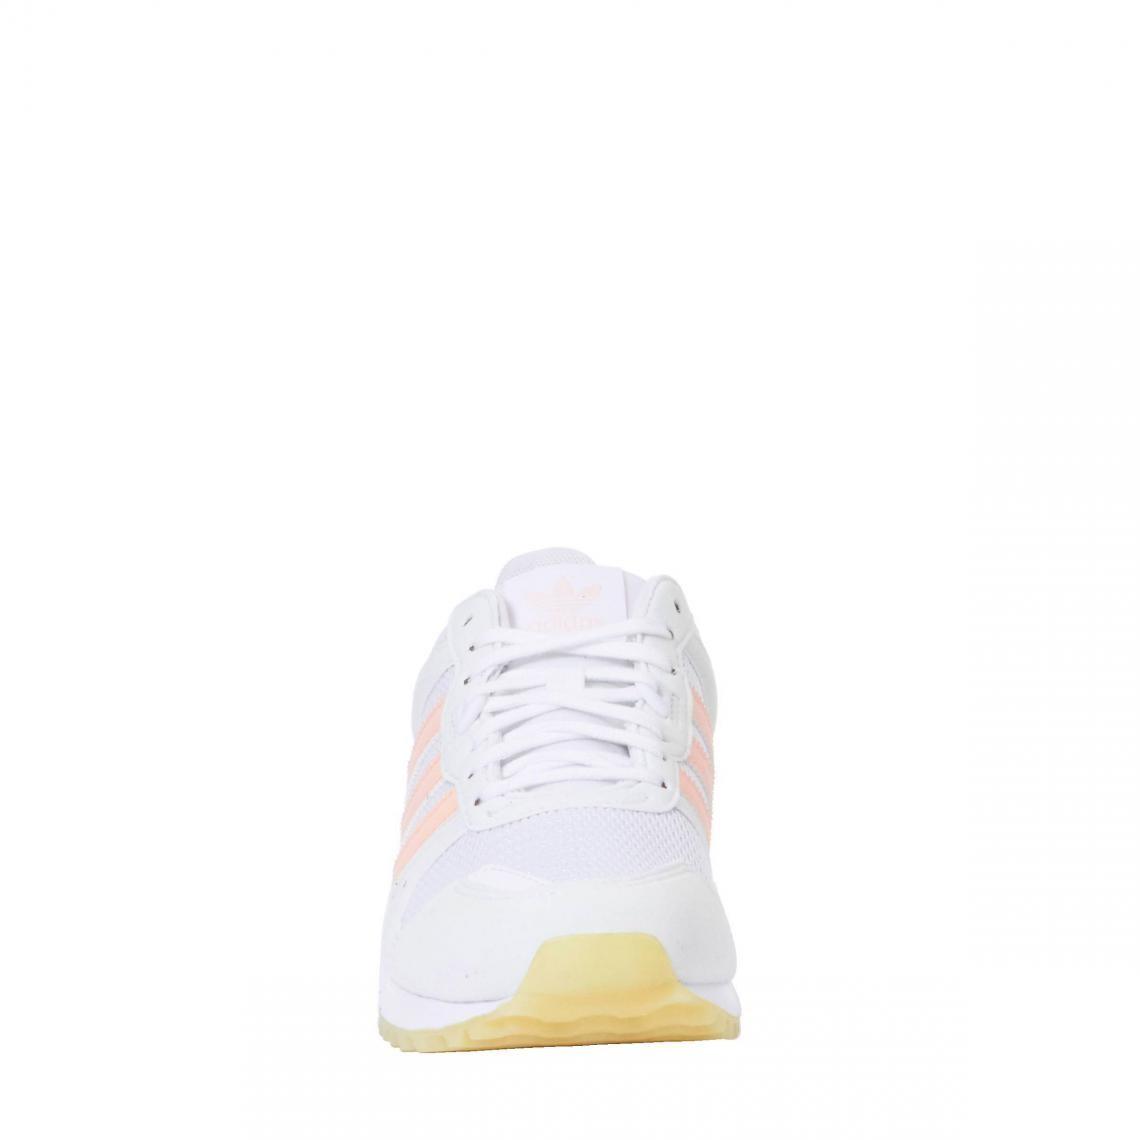 chaussures basse adidas